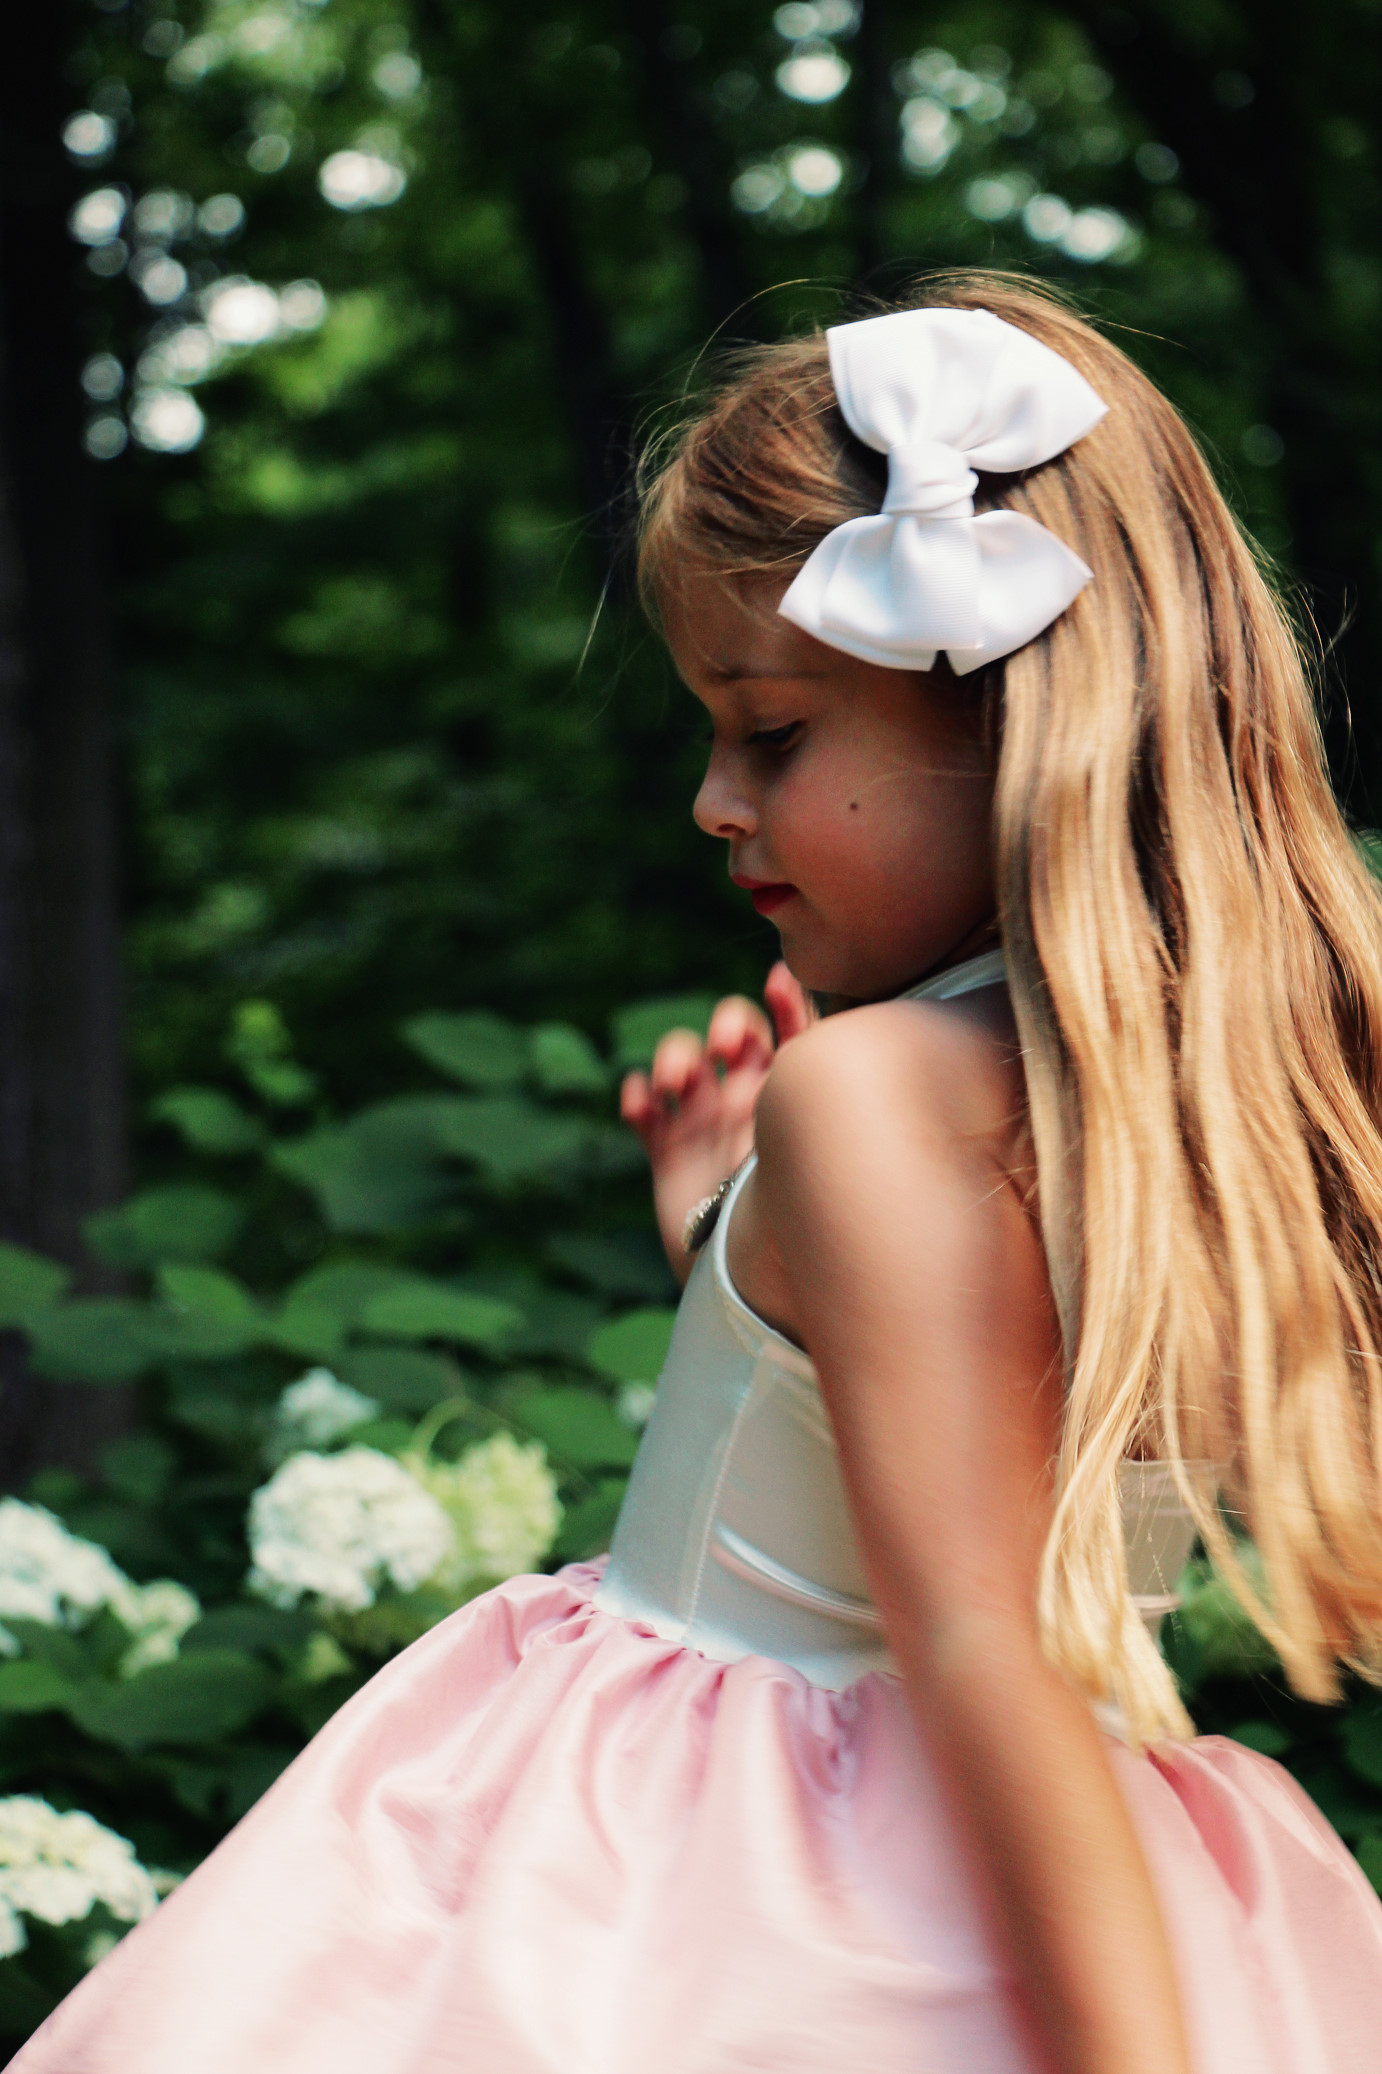 – 4 Katherine Eastman portrait photography Miami south florida beauty fairytale fashion babiekins childrens ohio blog make up artist color